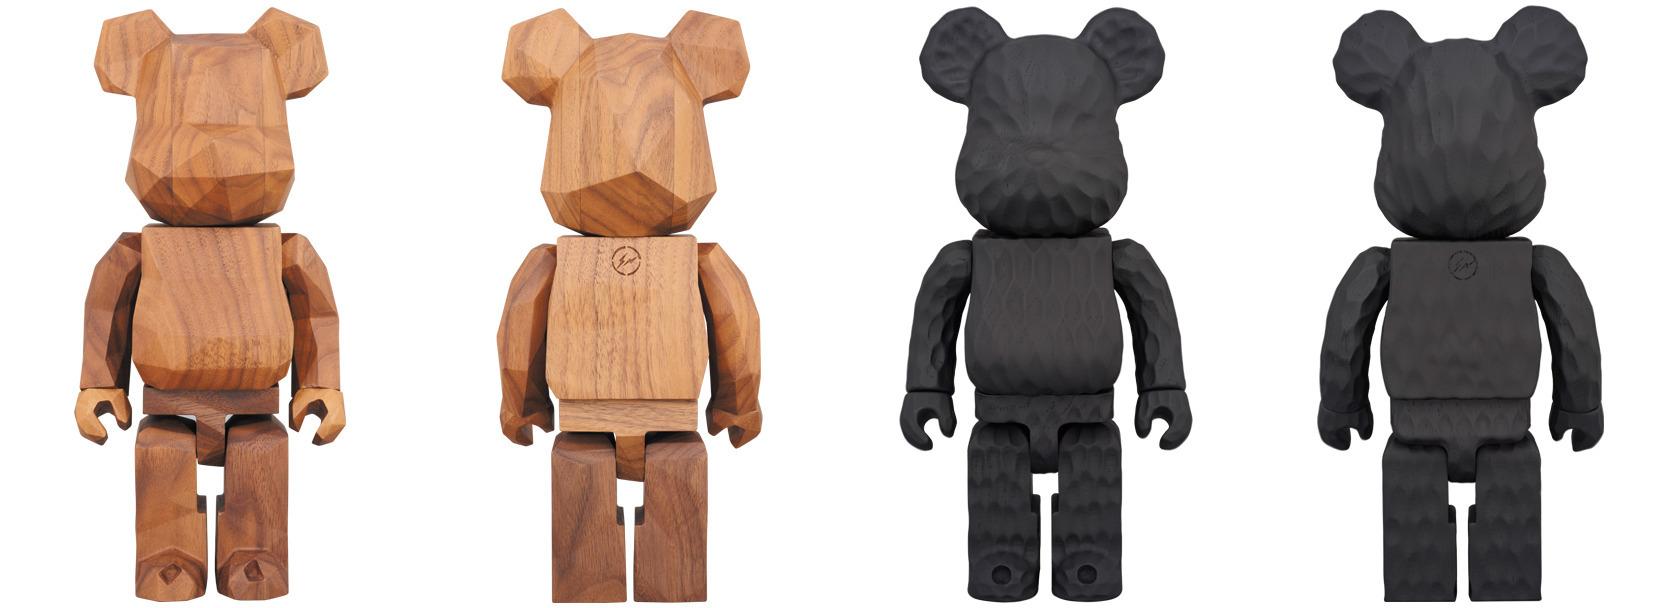 Love wood Bearbricks Fragment D - lucian | ello